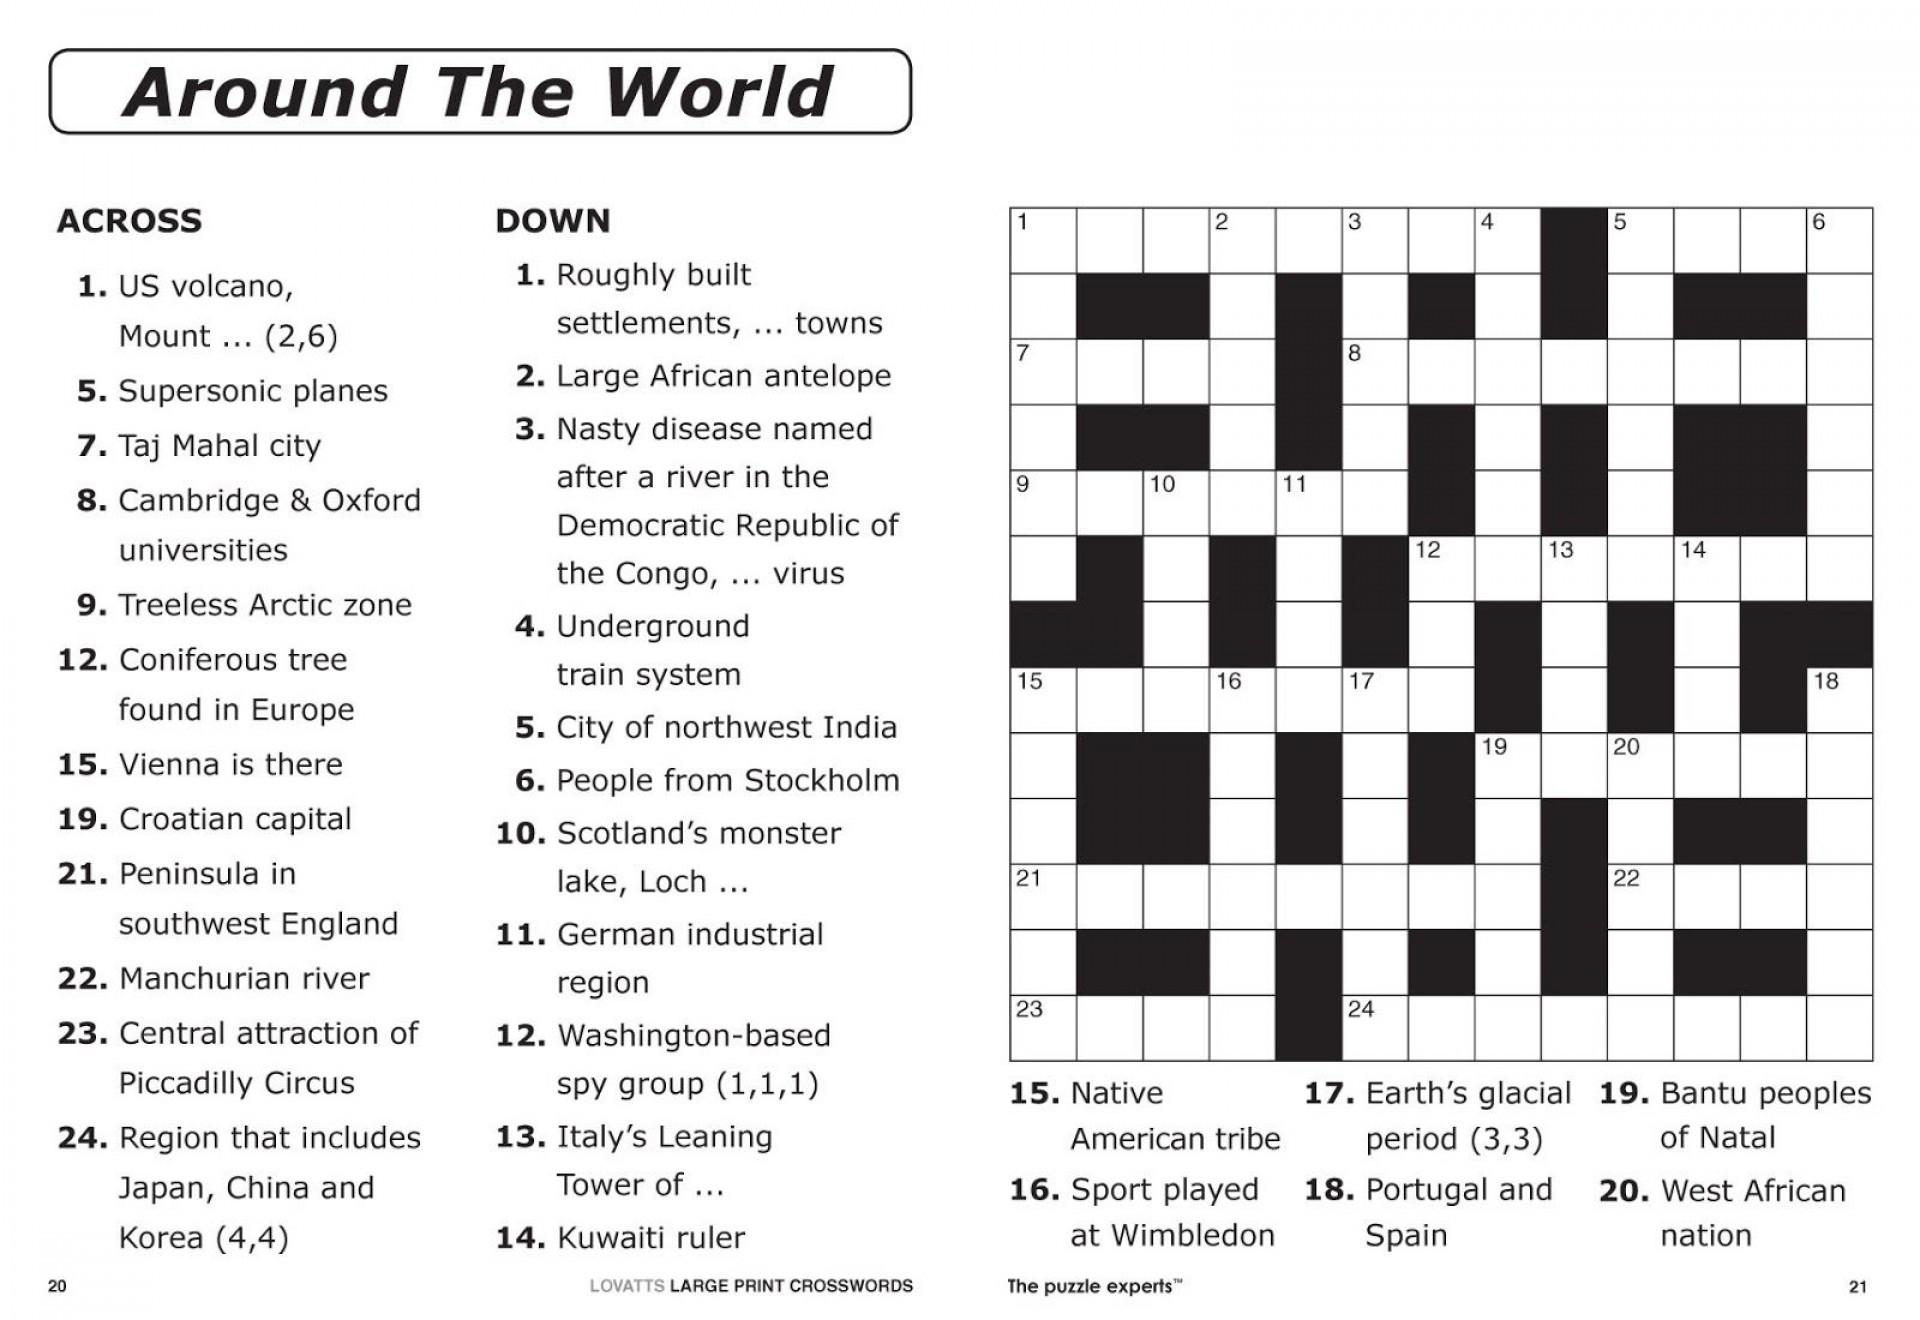 Crossword Puzzle Printable Large Print Crosswords ~ Themarketonholly - Printable Crossword Puzzles For Adults Large Print